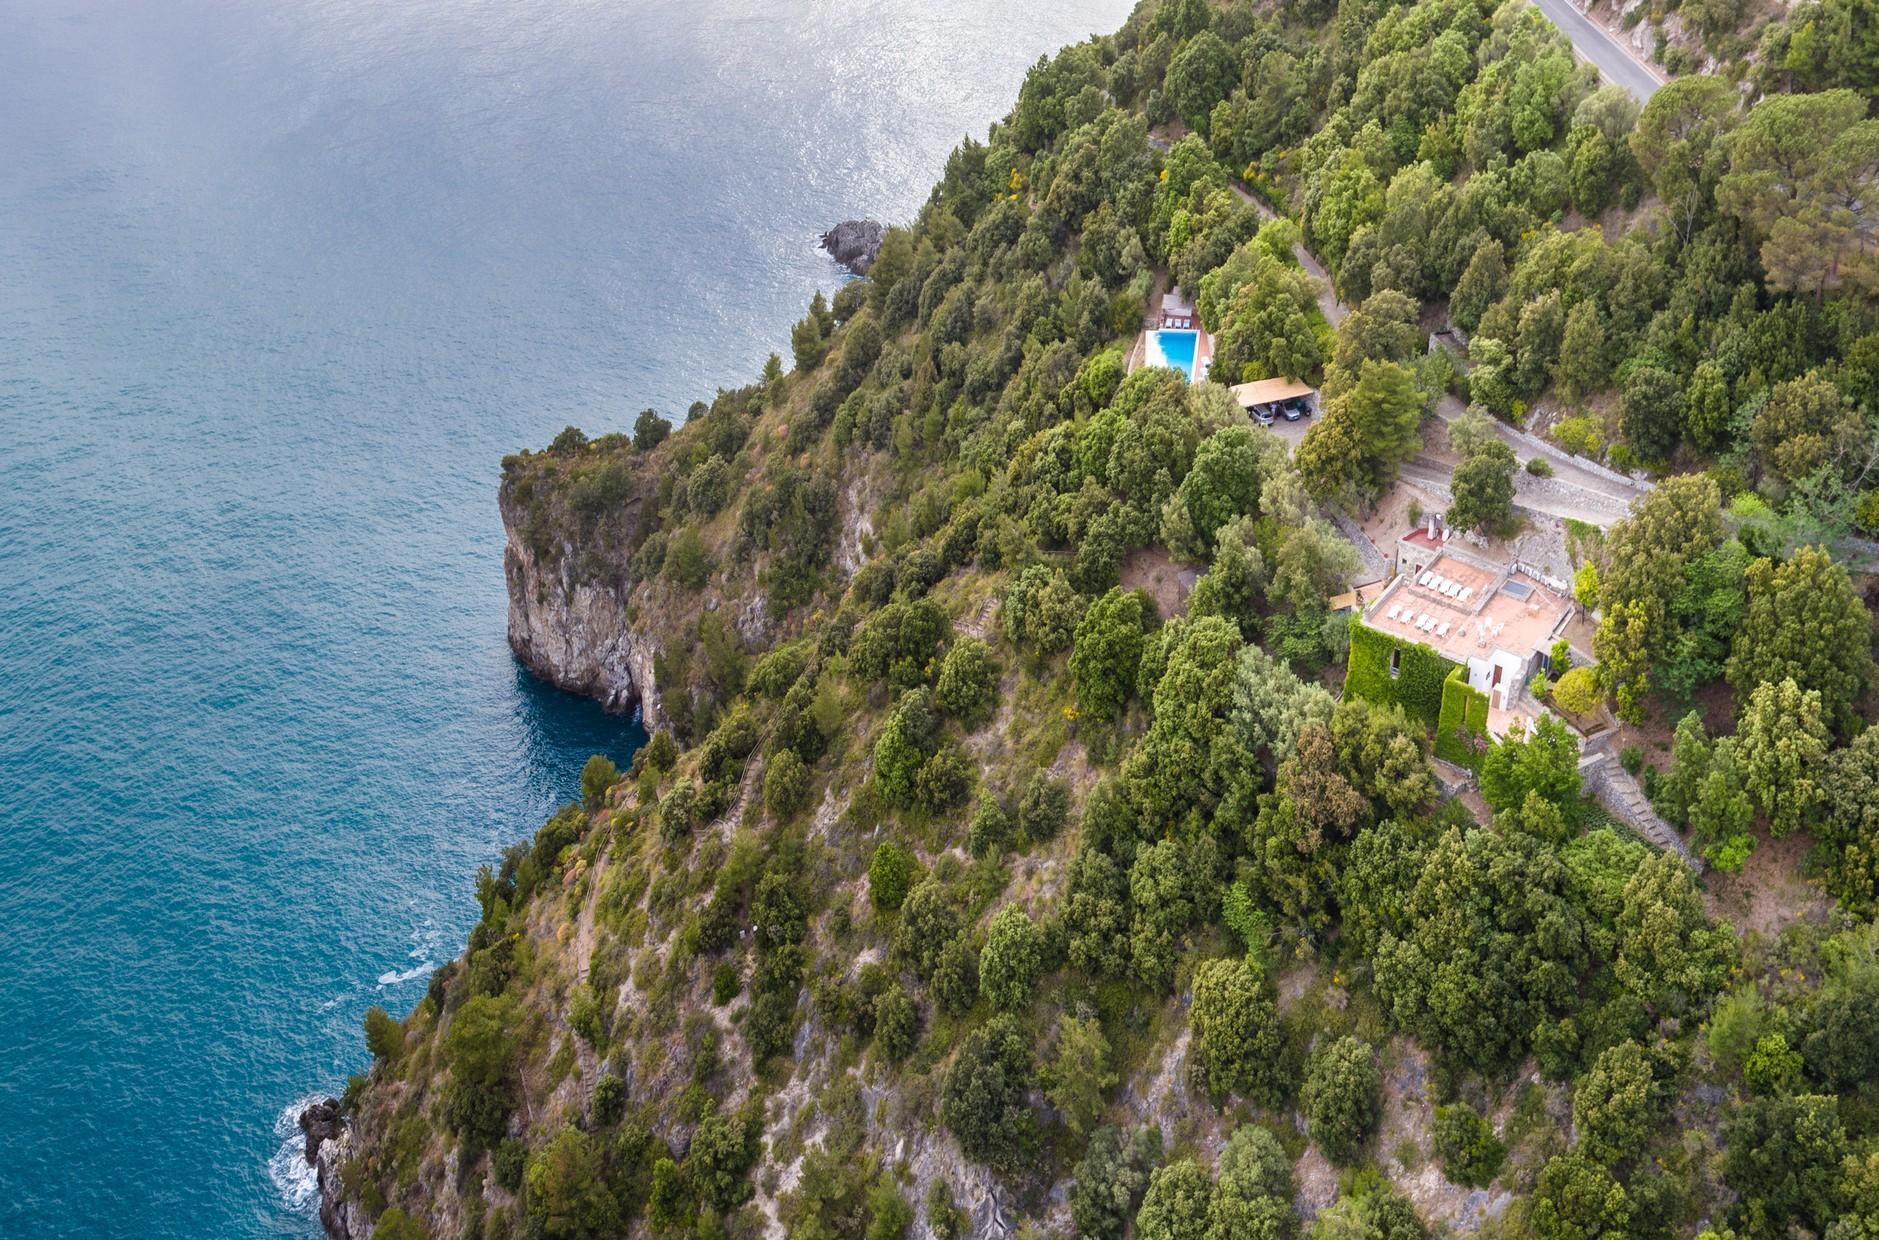 Villa pied dans l'eau in Costiera Amalfitana - 32